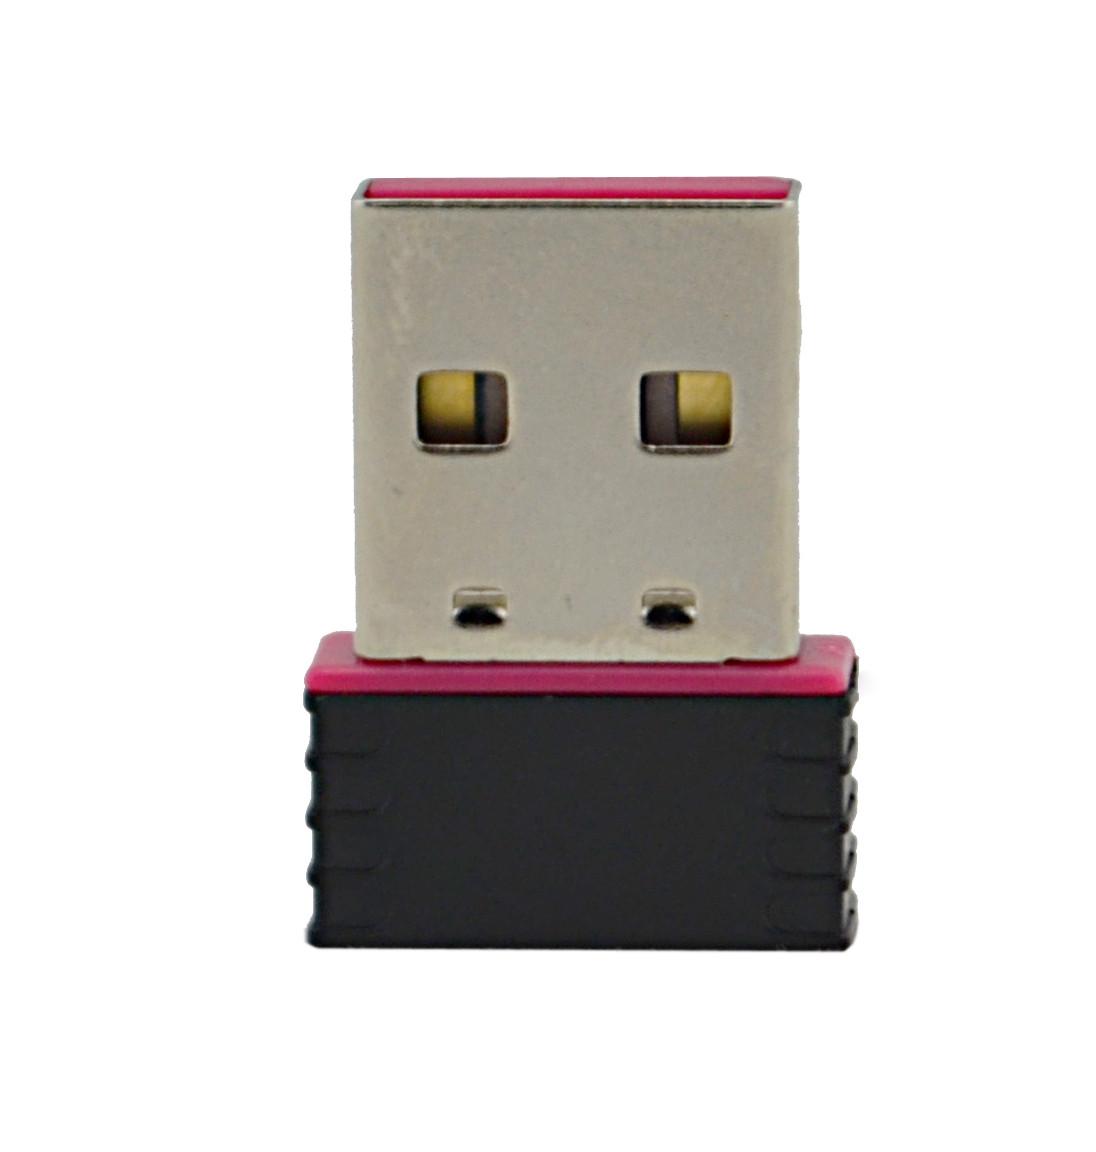 USB сетевой адаптер Dellta Wi Fi 802.11n LV-UW03 + диск (3146)